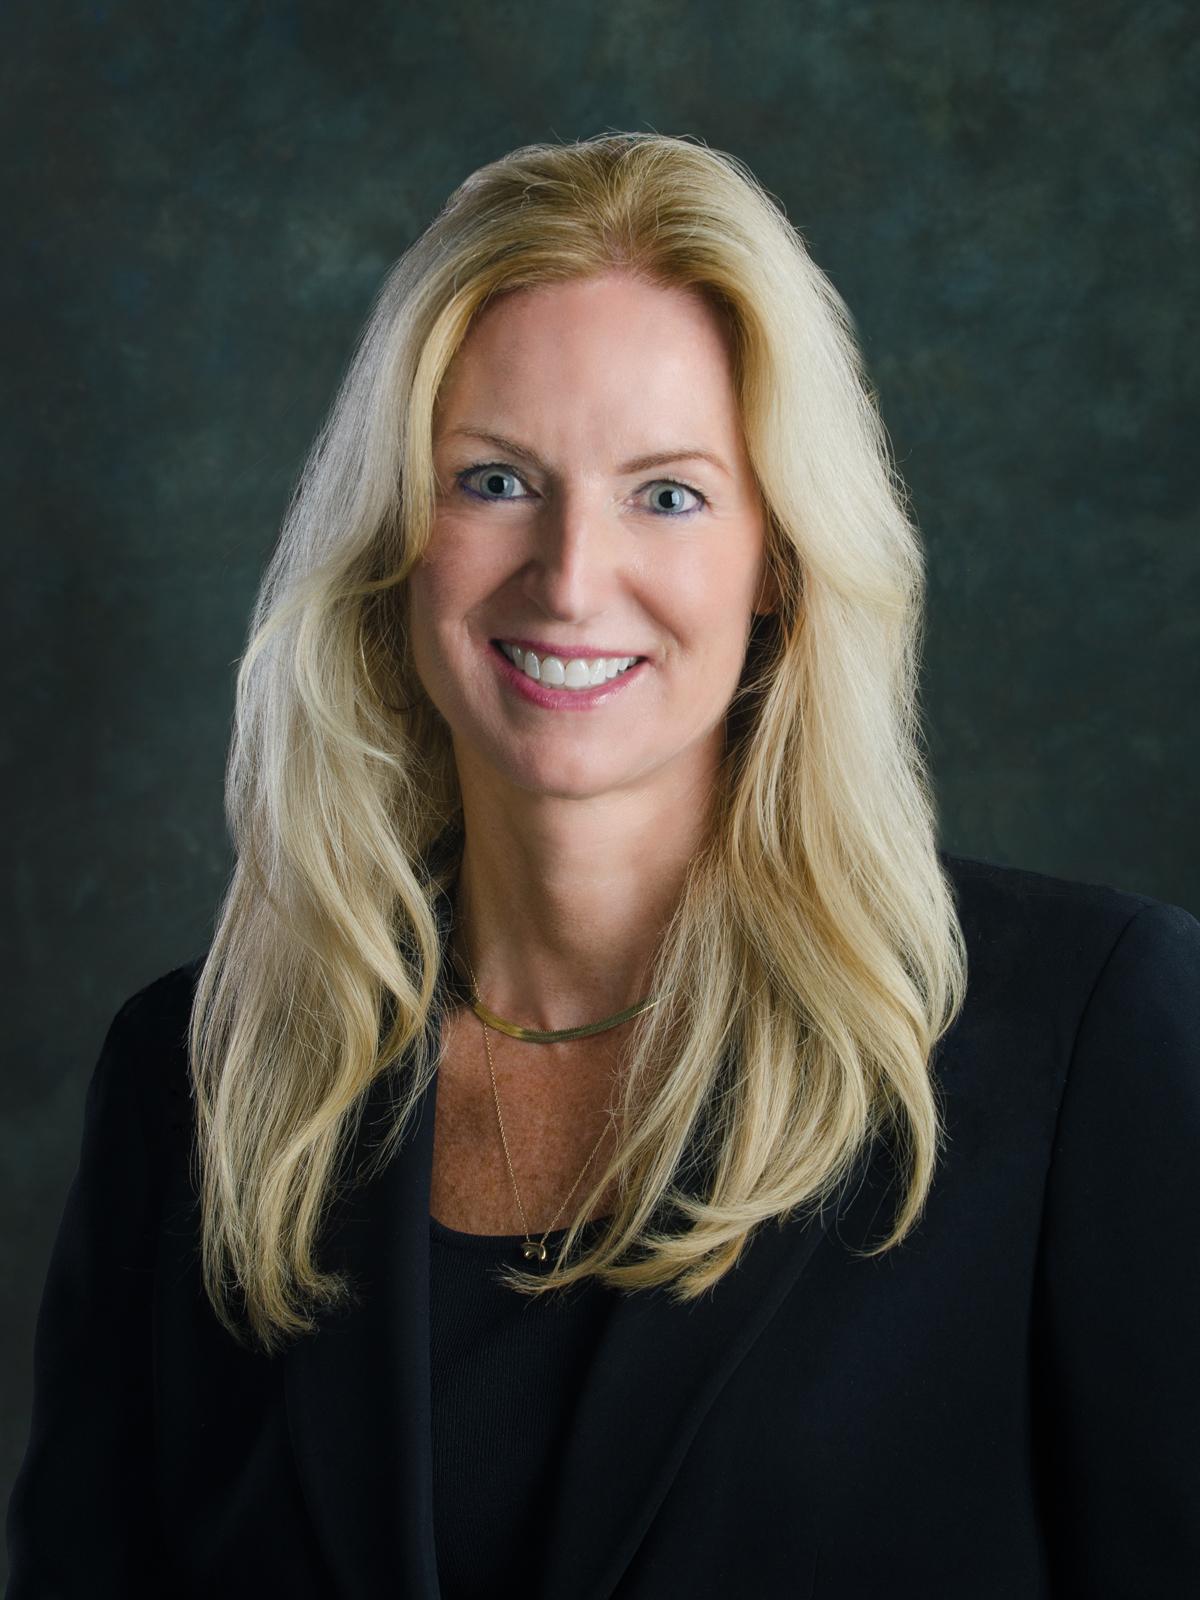 Beth Brady, CMO of Principal Financial